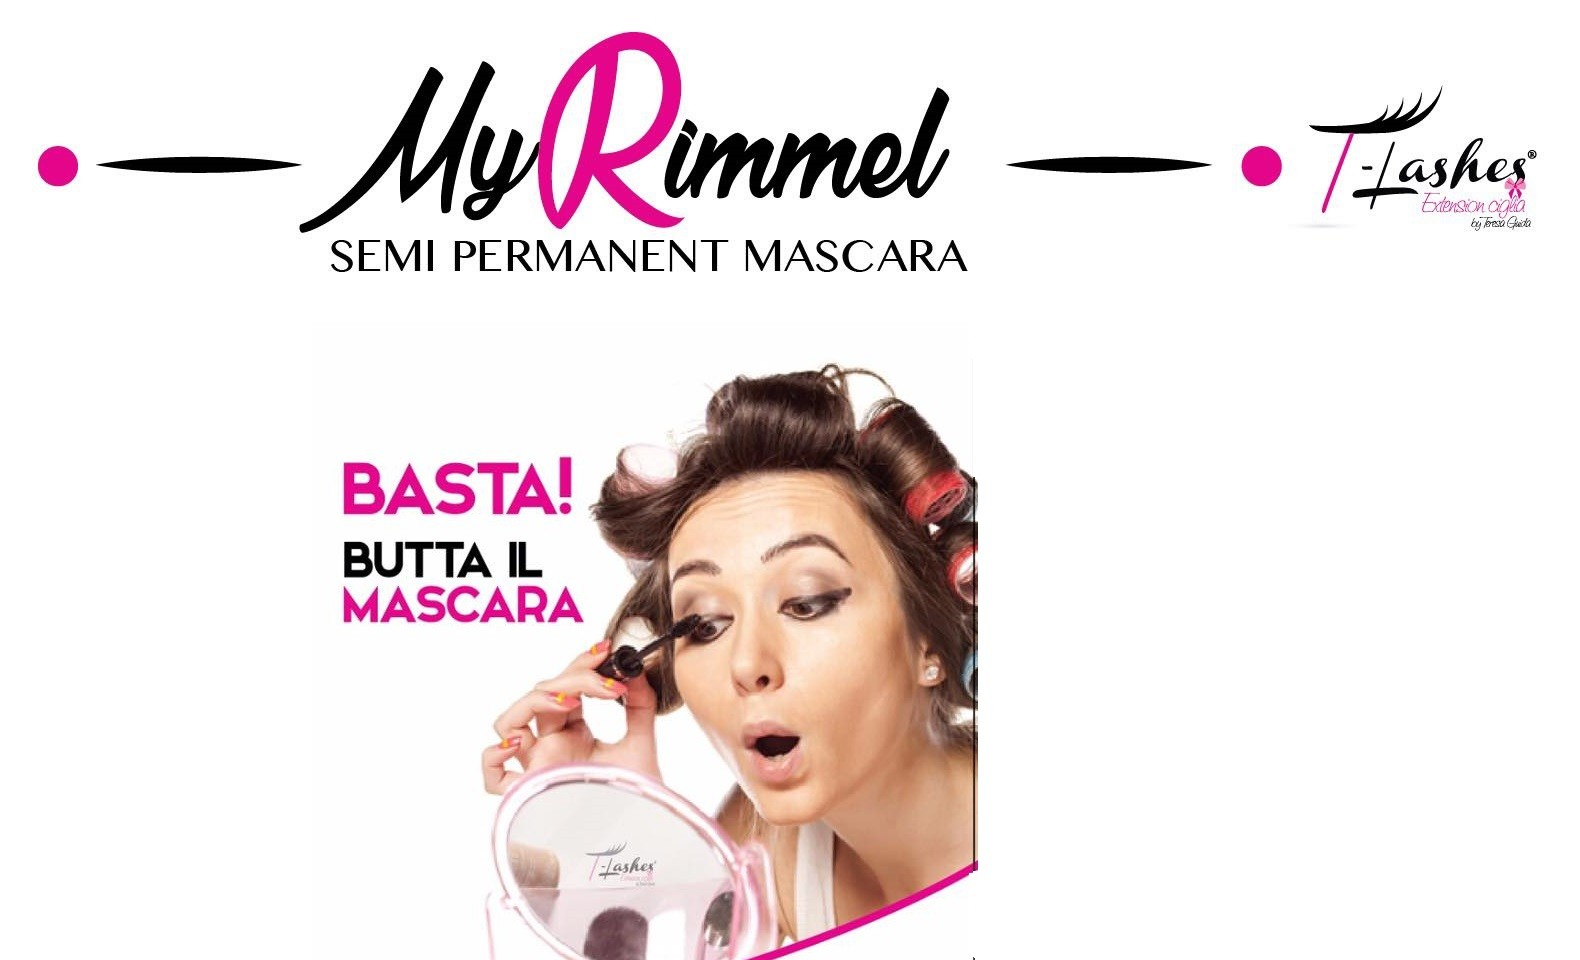 My rimmel Mascara